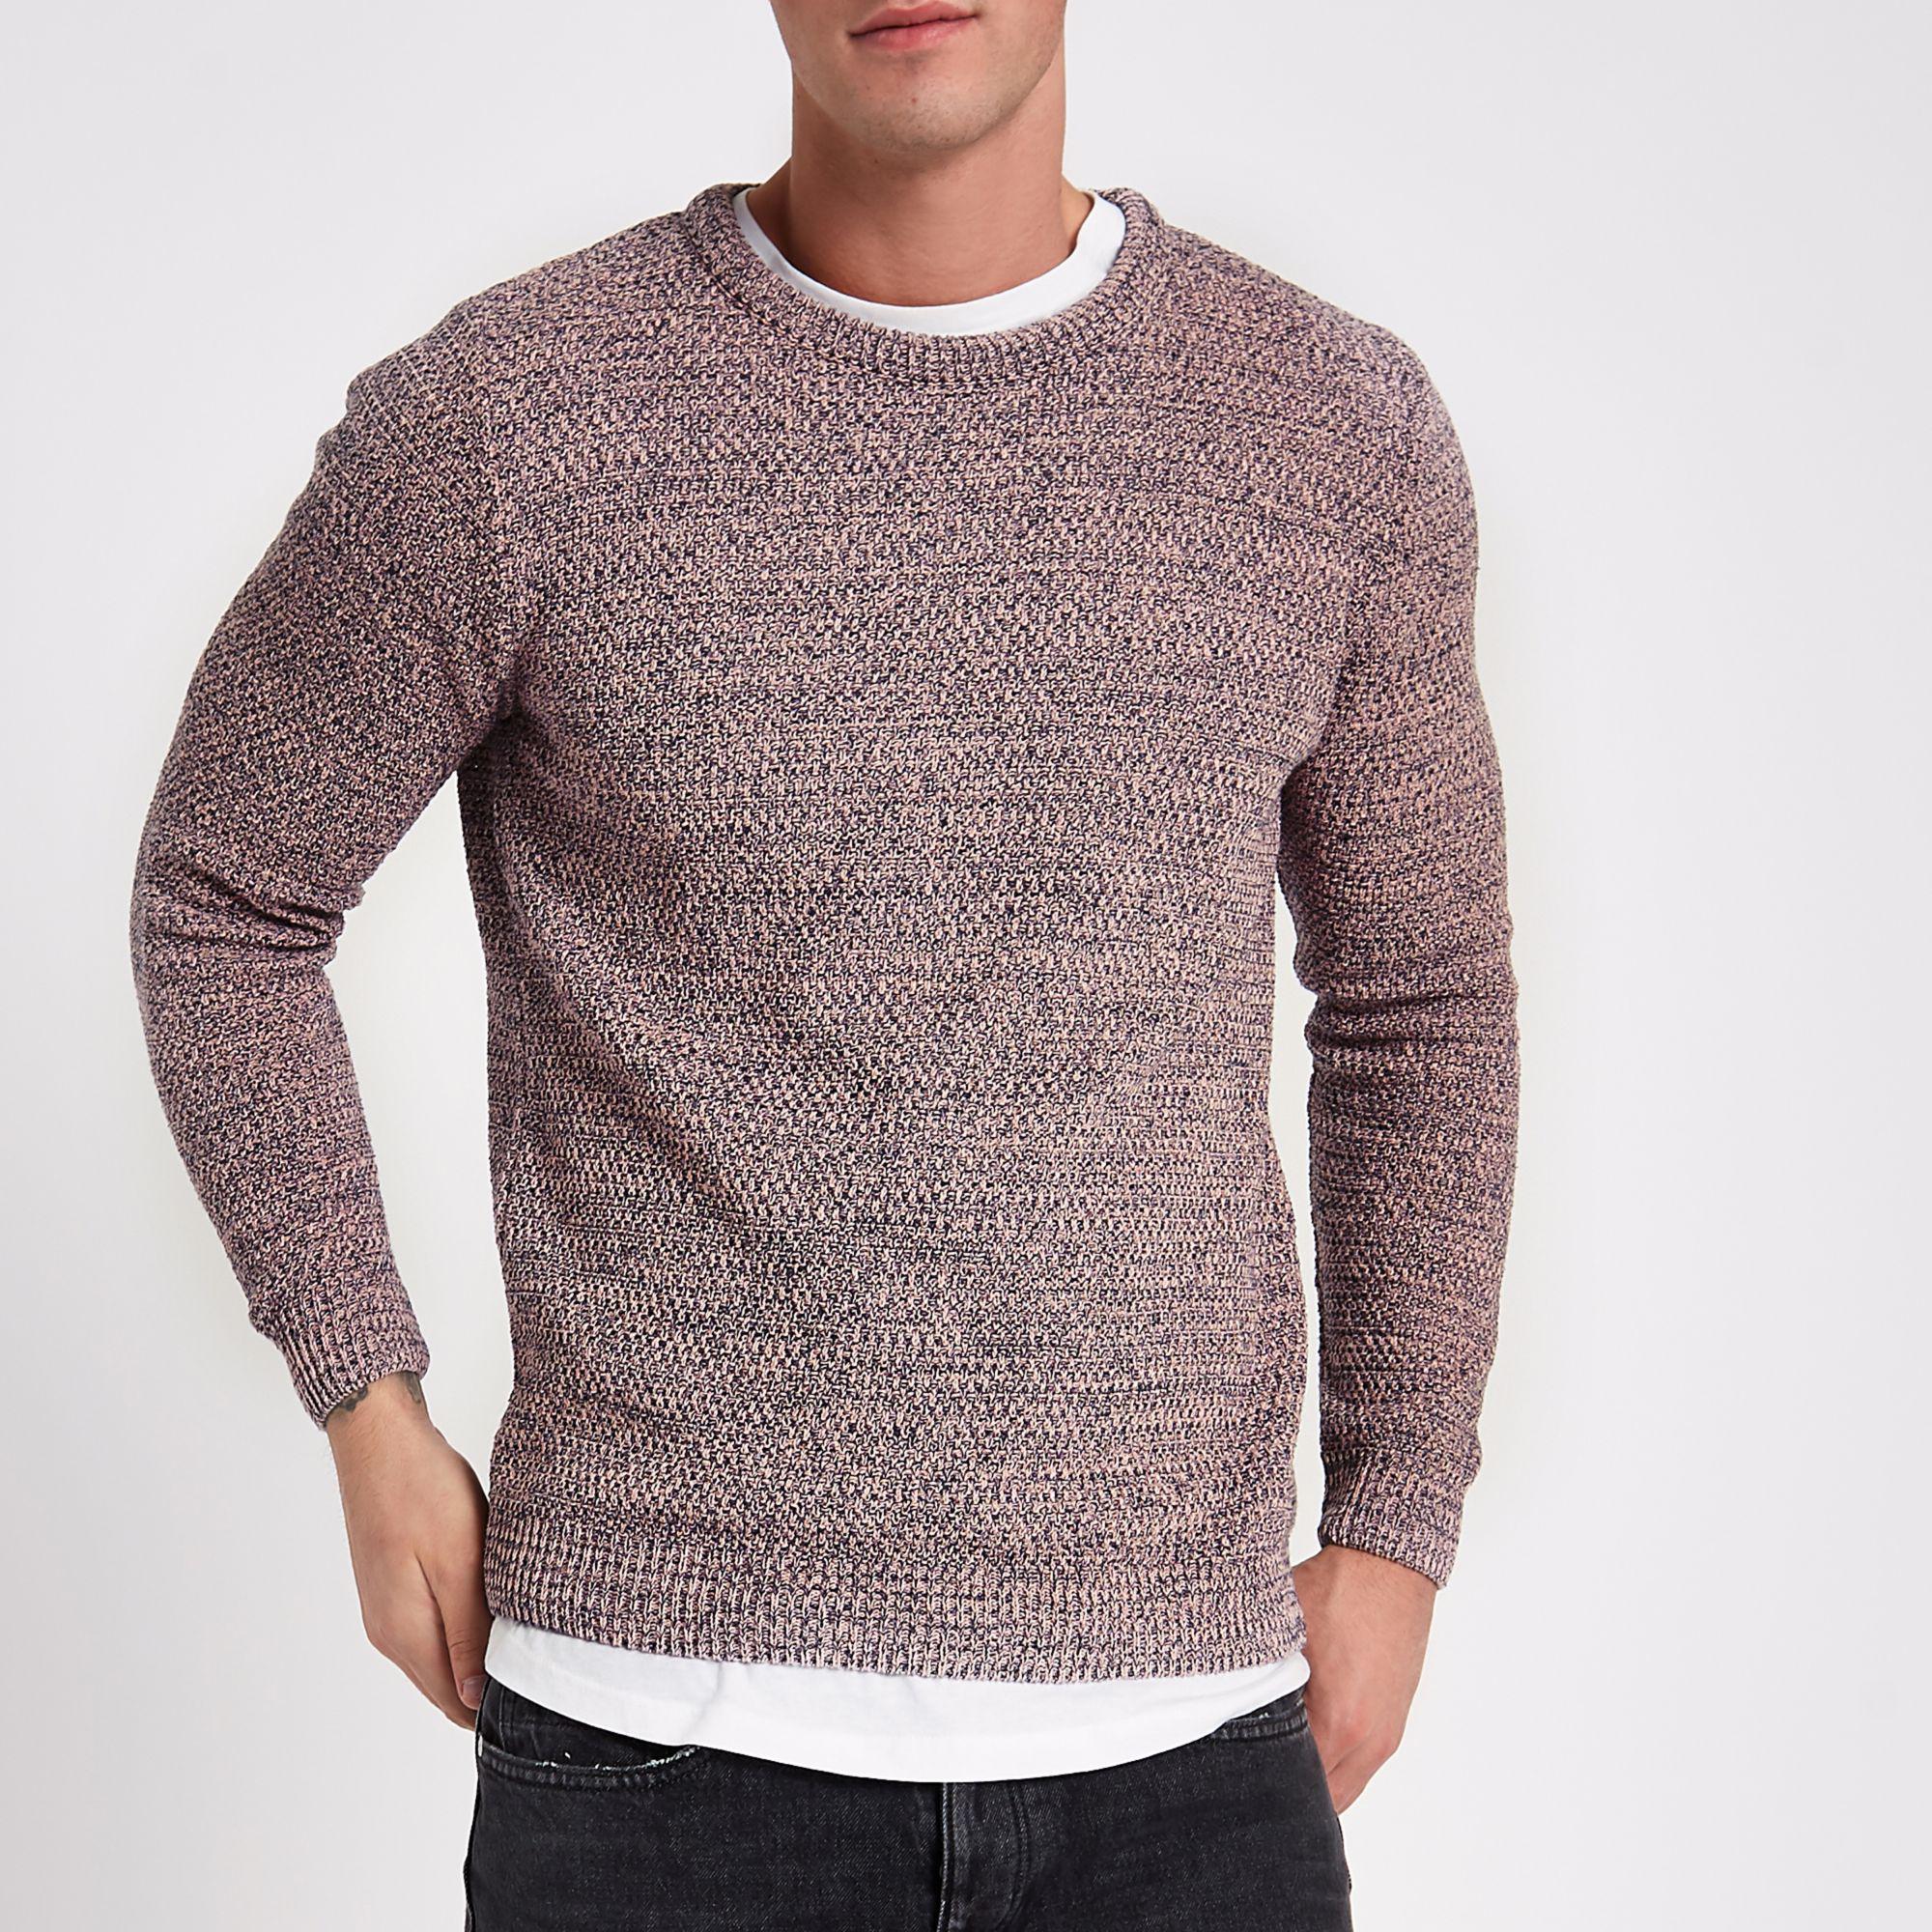 9d243461165 River Island Textured Knit Slim Fit Crew Neck Jumper in Pink for Men ...